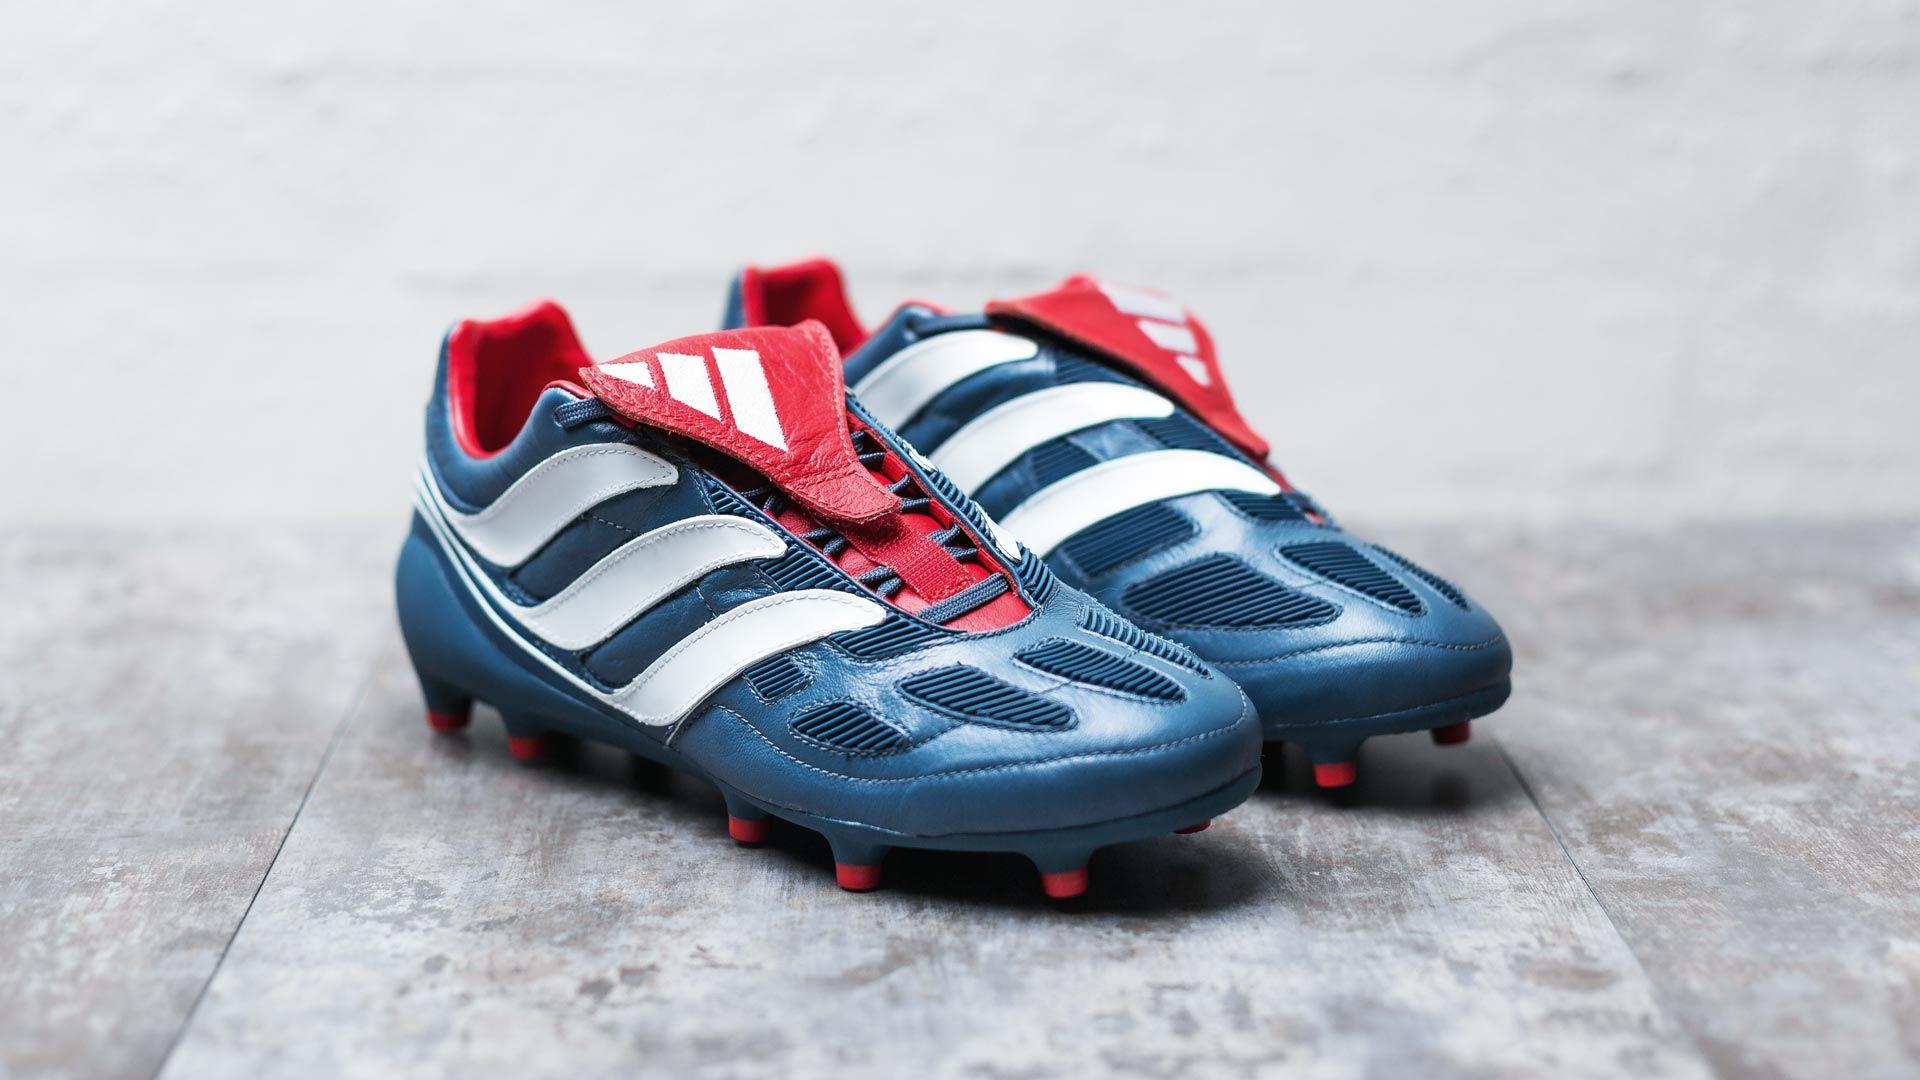 De Verdad subterraneo puerta  Botas de fútbol adidas present Predator Precision remake 2017 em 2020    Adidas predador